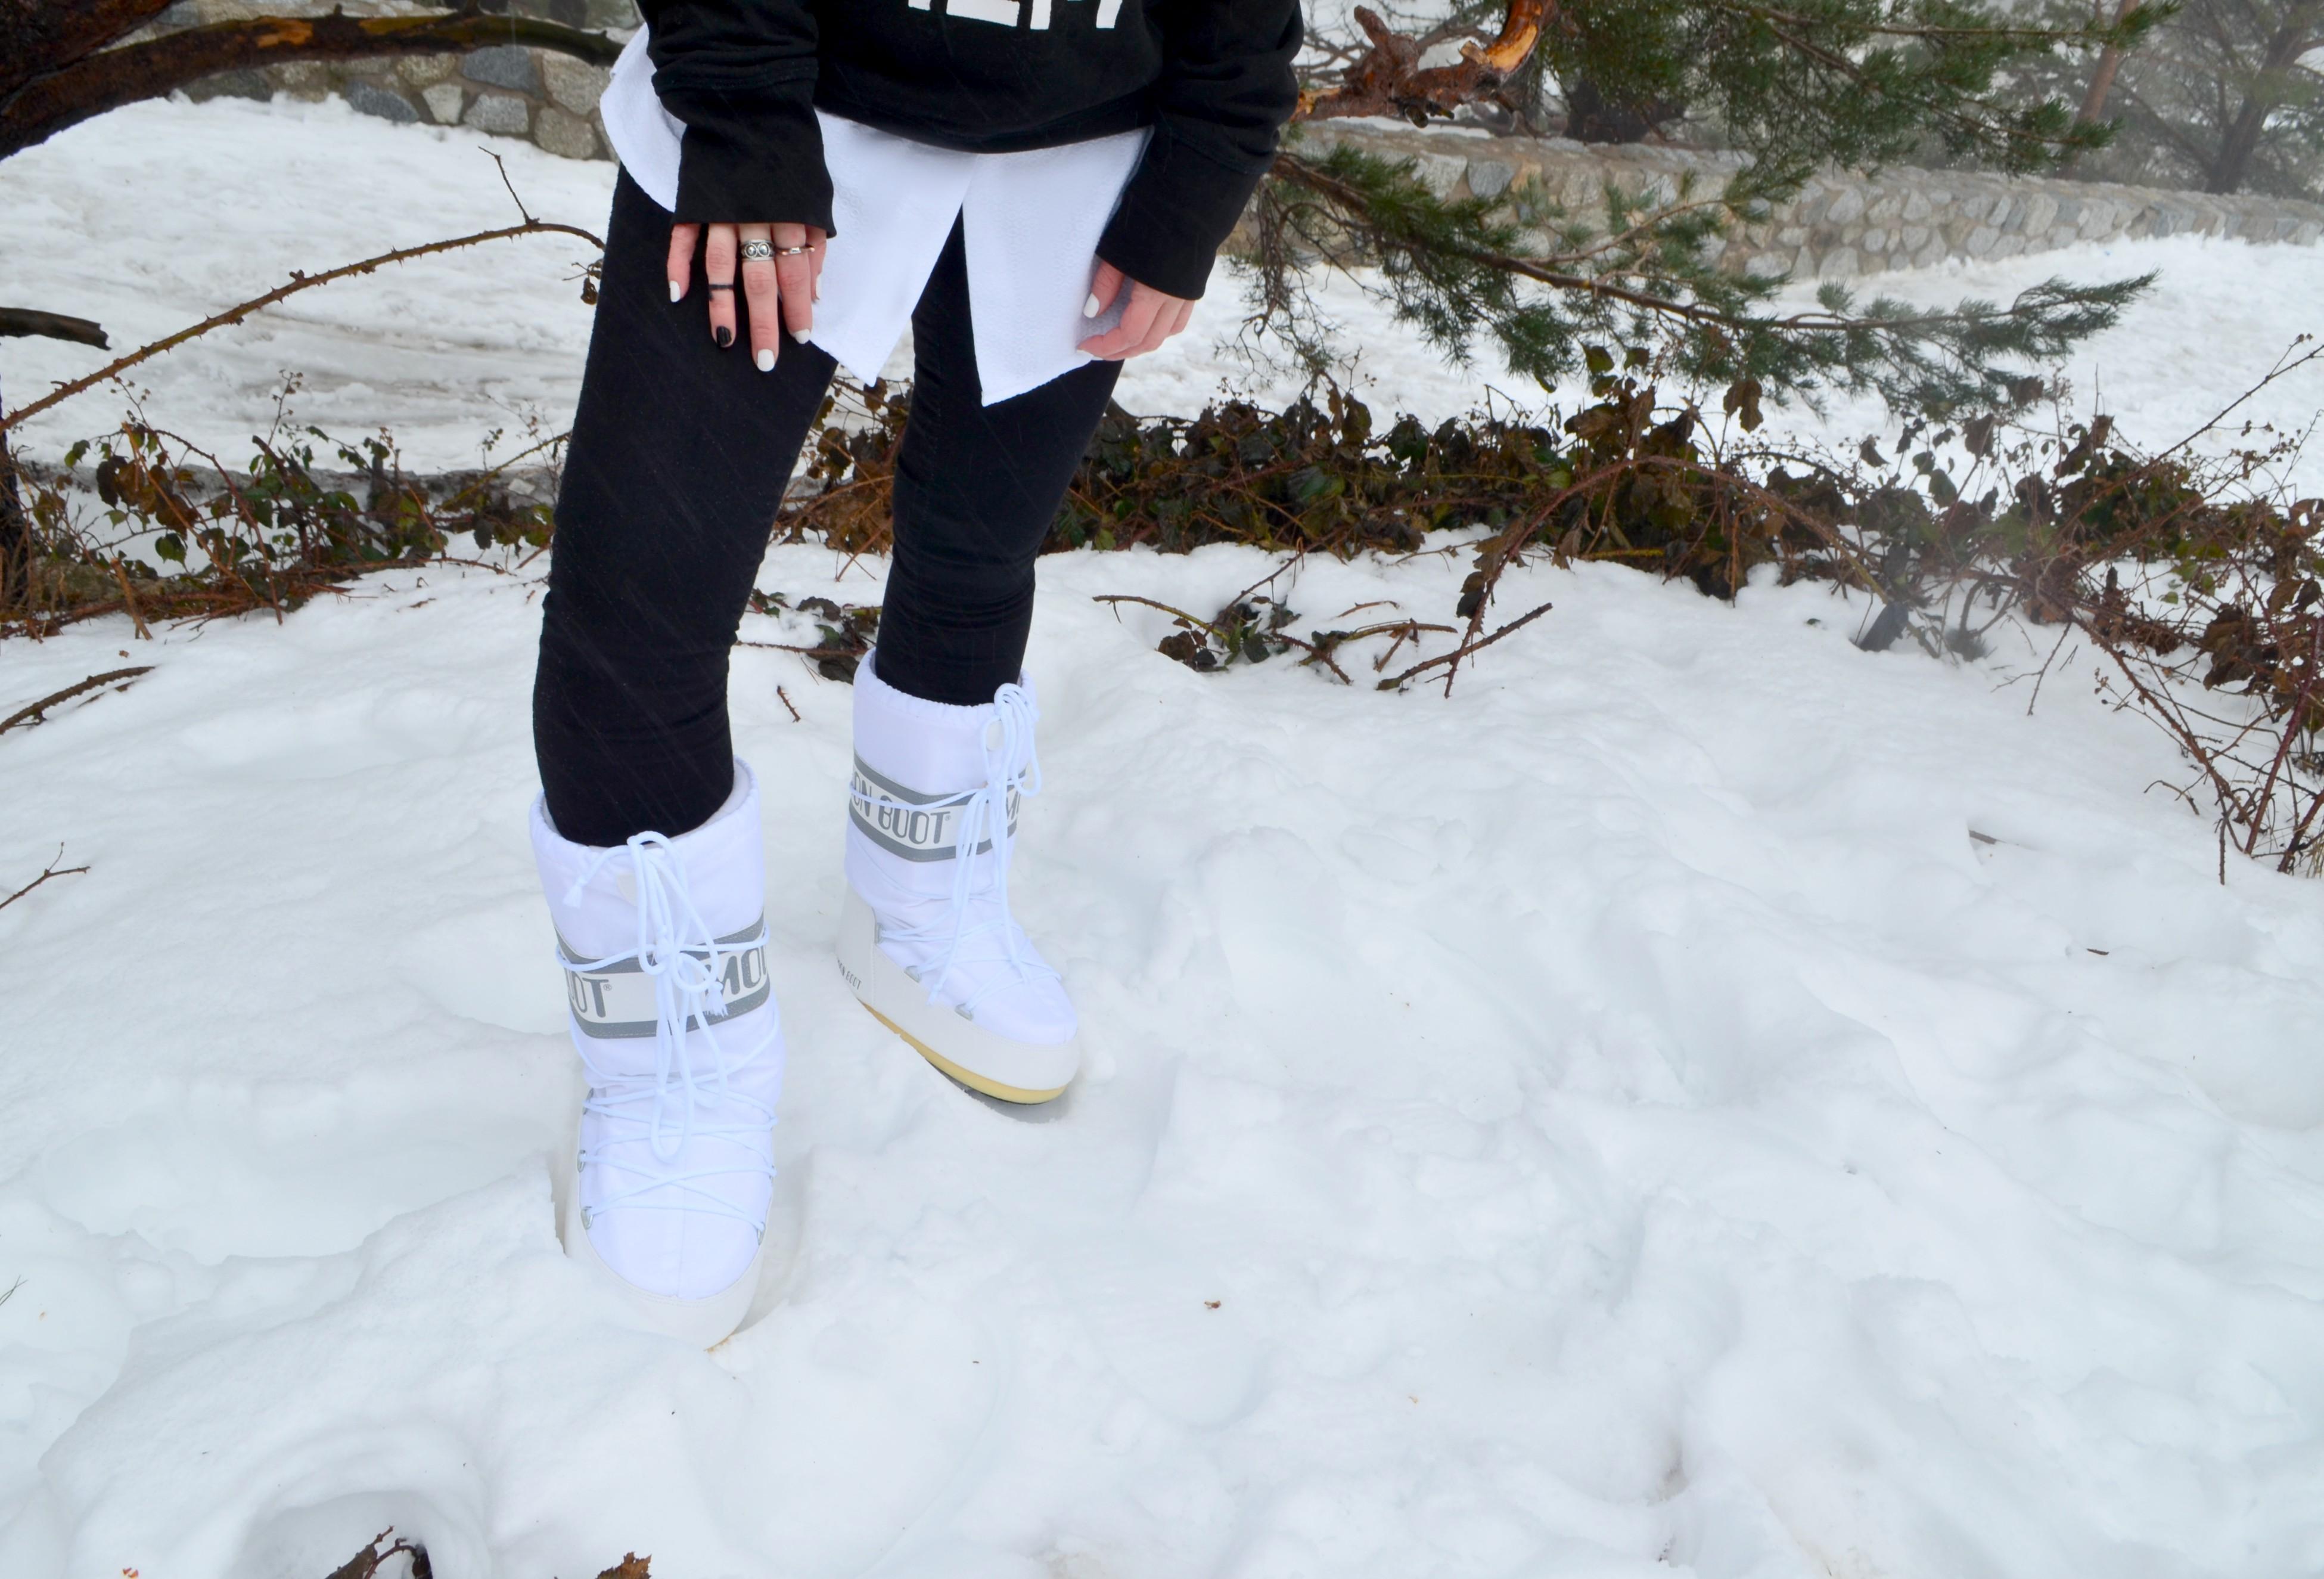 wearemoonboot-blog-de-moda-ChicAdicta-snow-style-Chic-Adicta-fashionista-botas-de-nieve-trendy-girl-PiensaenChic-Piensa-en-Chic